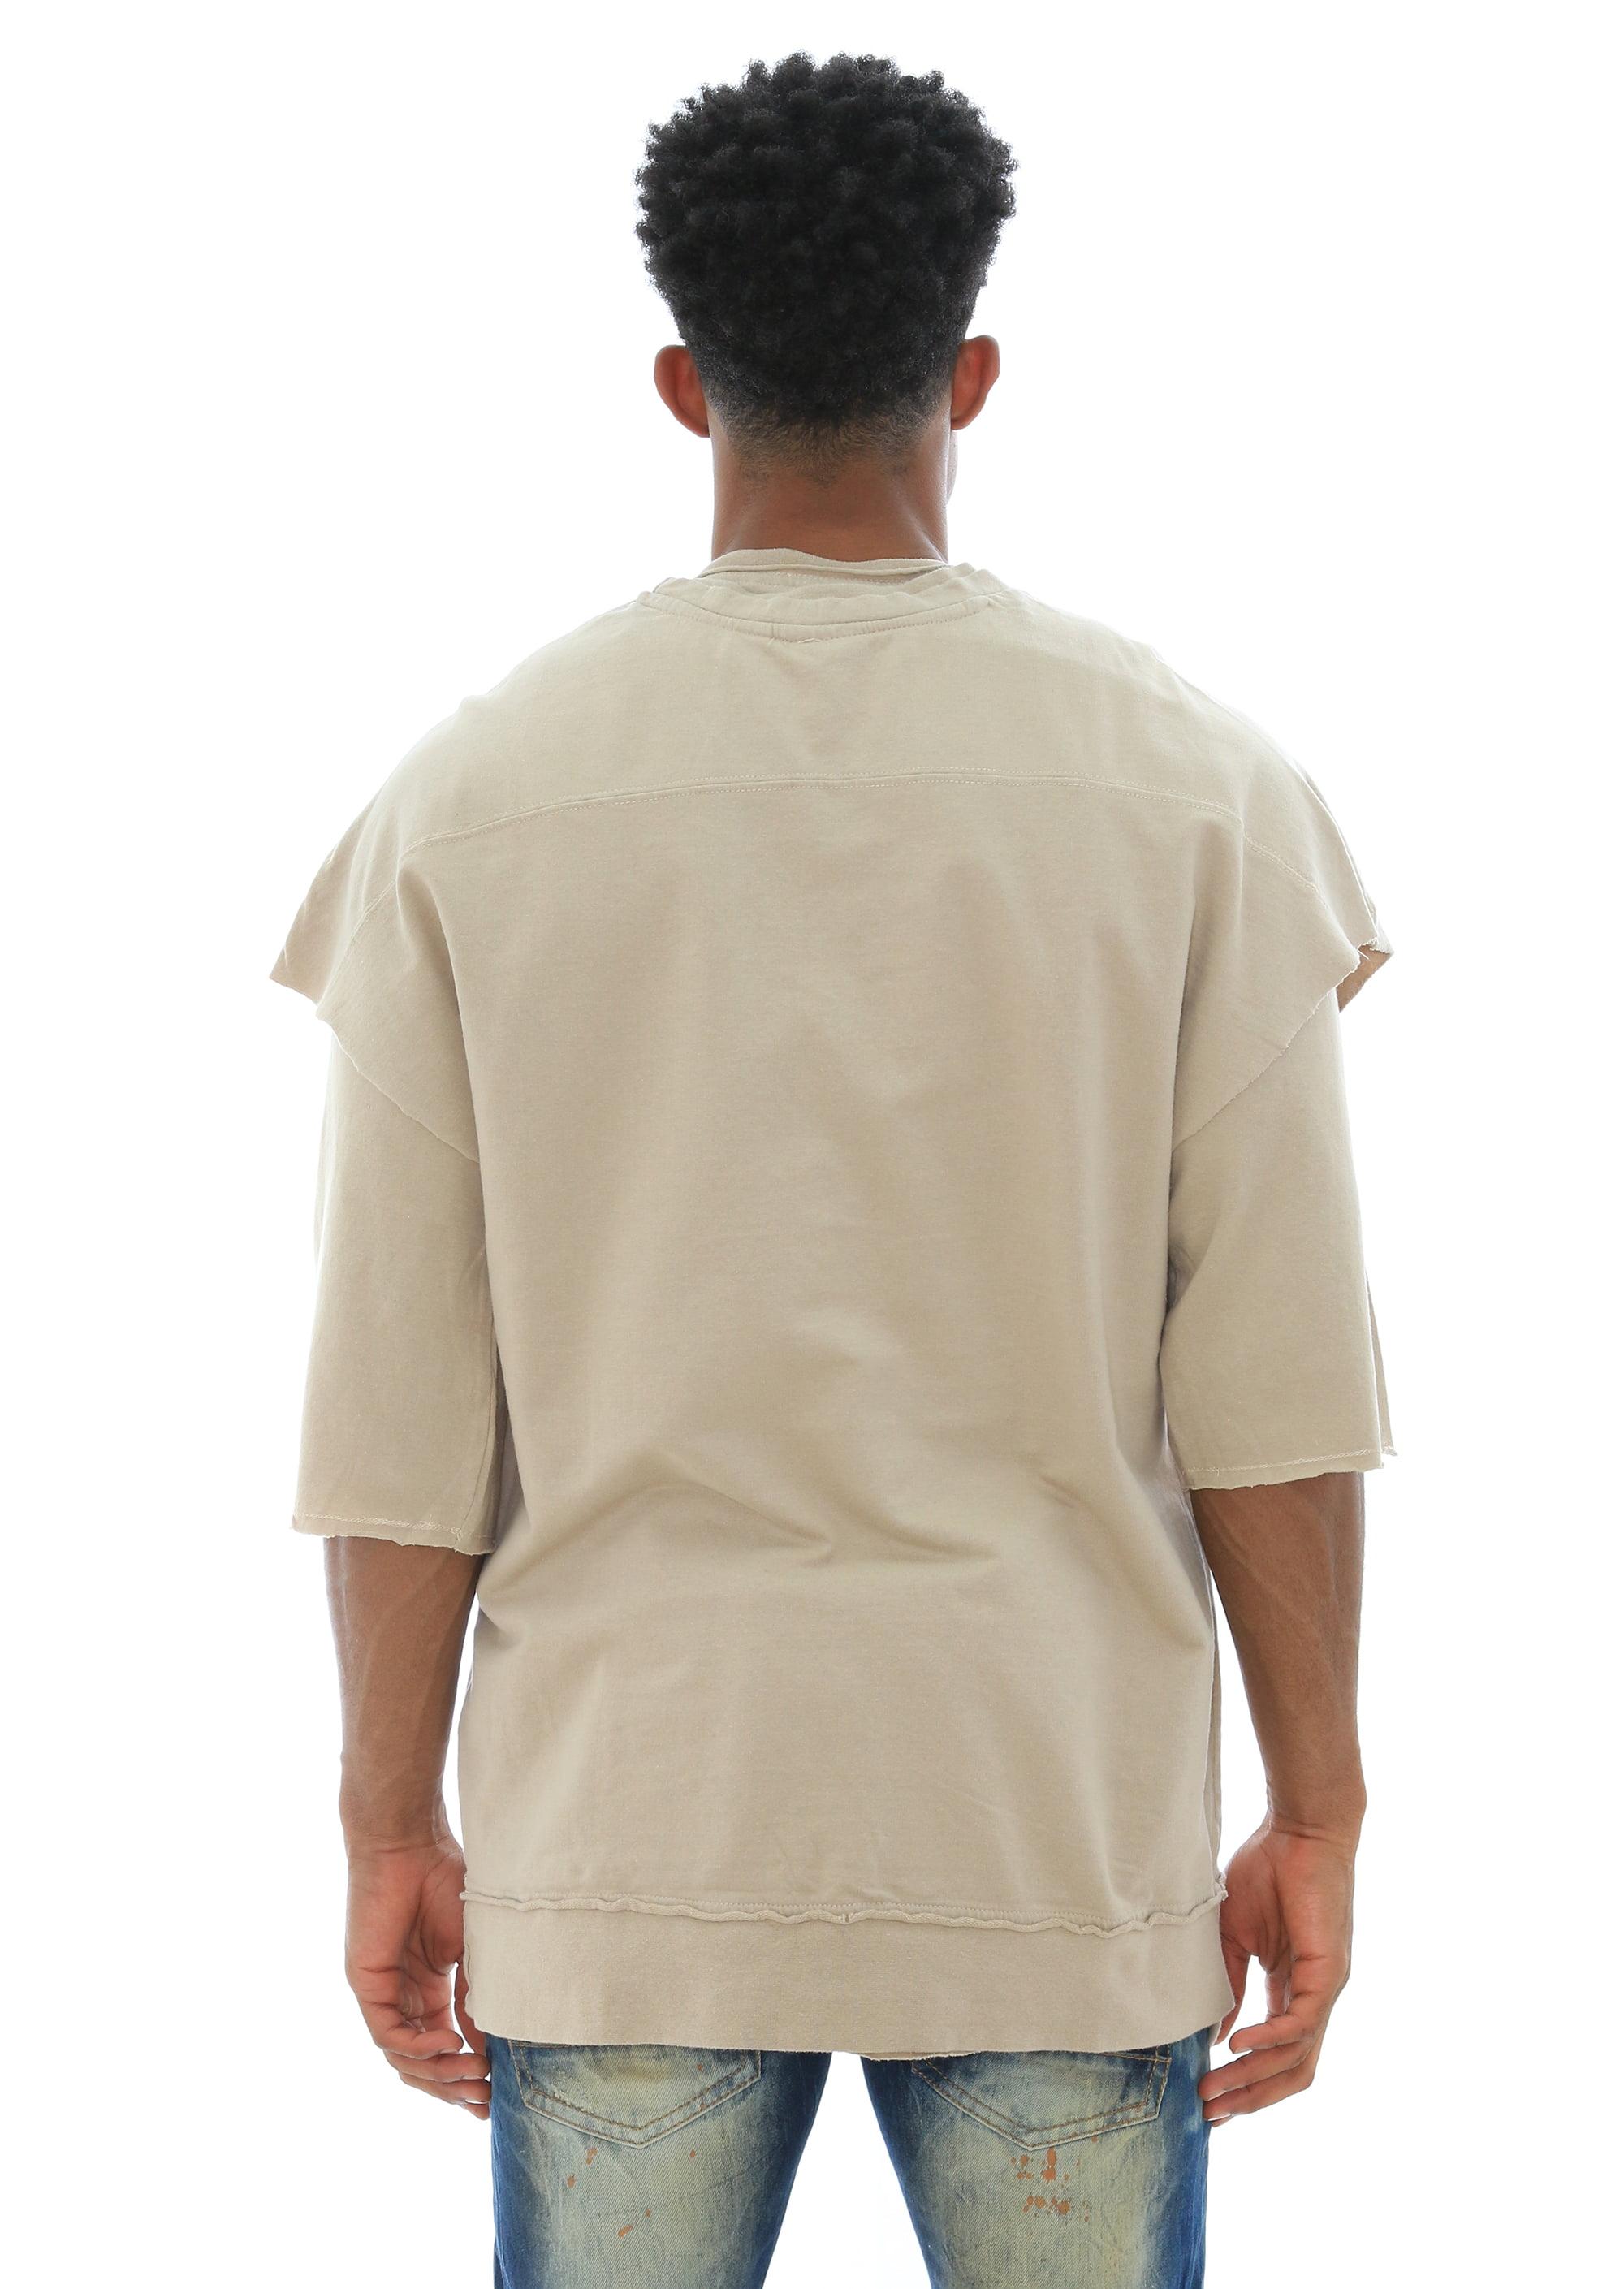 d7f118ee80d56f Akademiks - Akademiks Men s Dobbs Layered 2 Piece Set Longline T Shirt -  Walmart.com